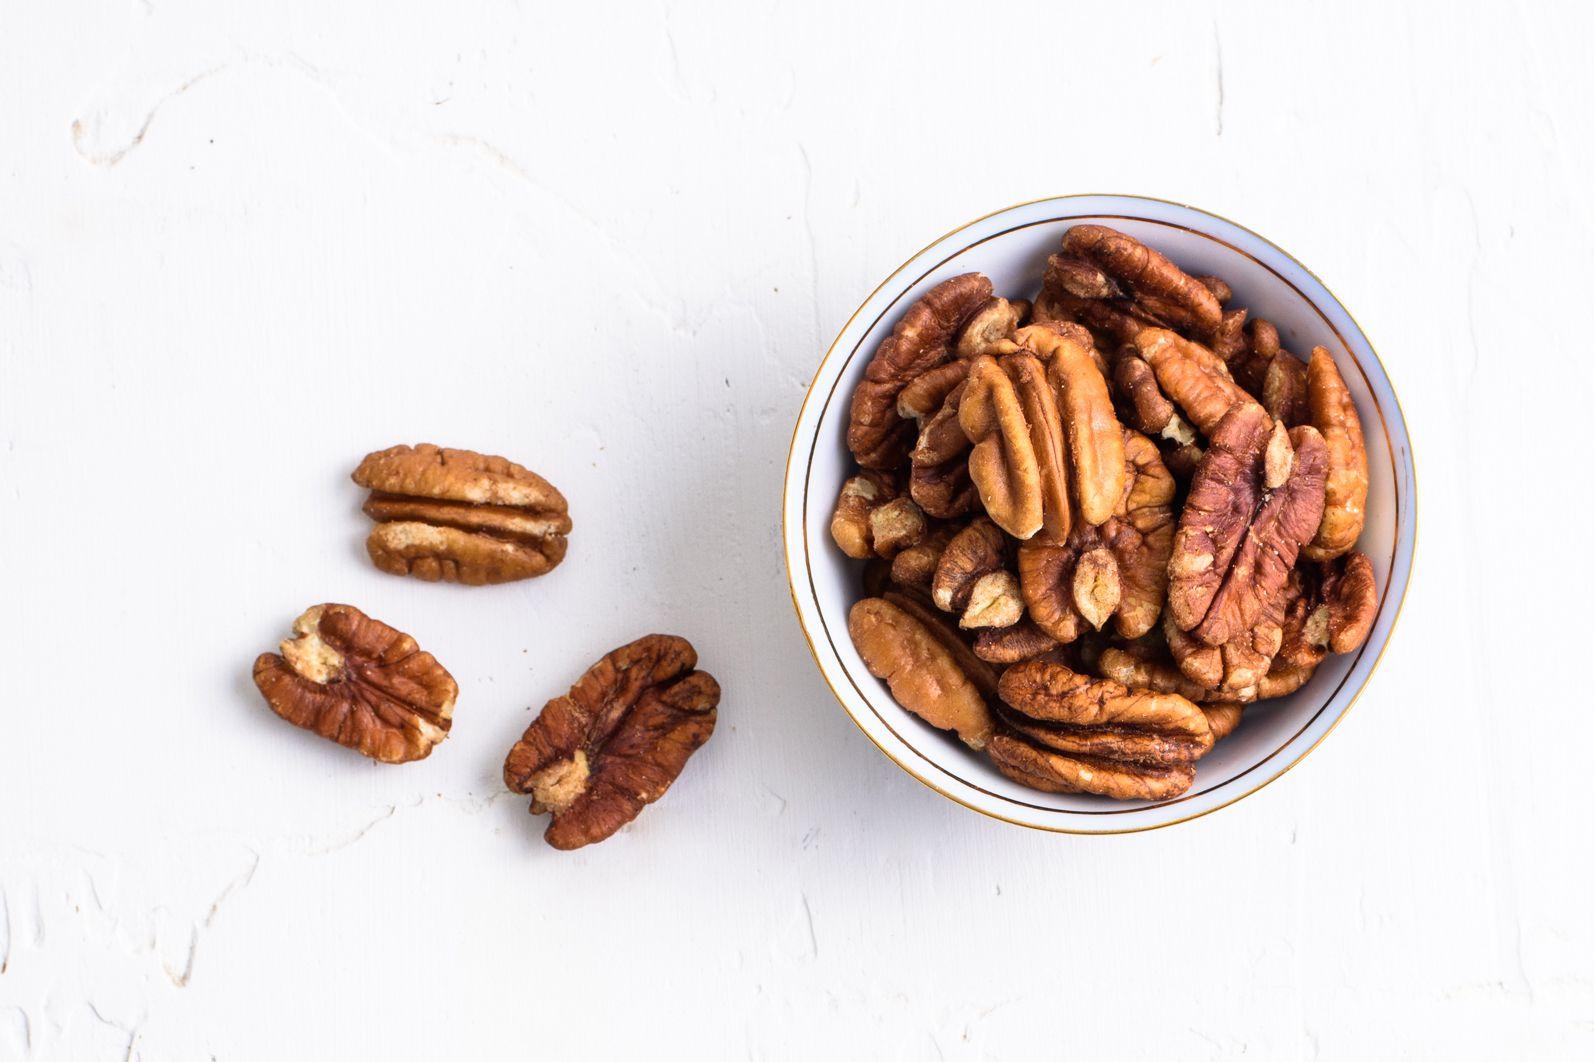 8 Common Nutrient Deficiencies on a Low-Carb Diet